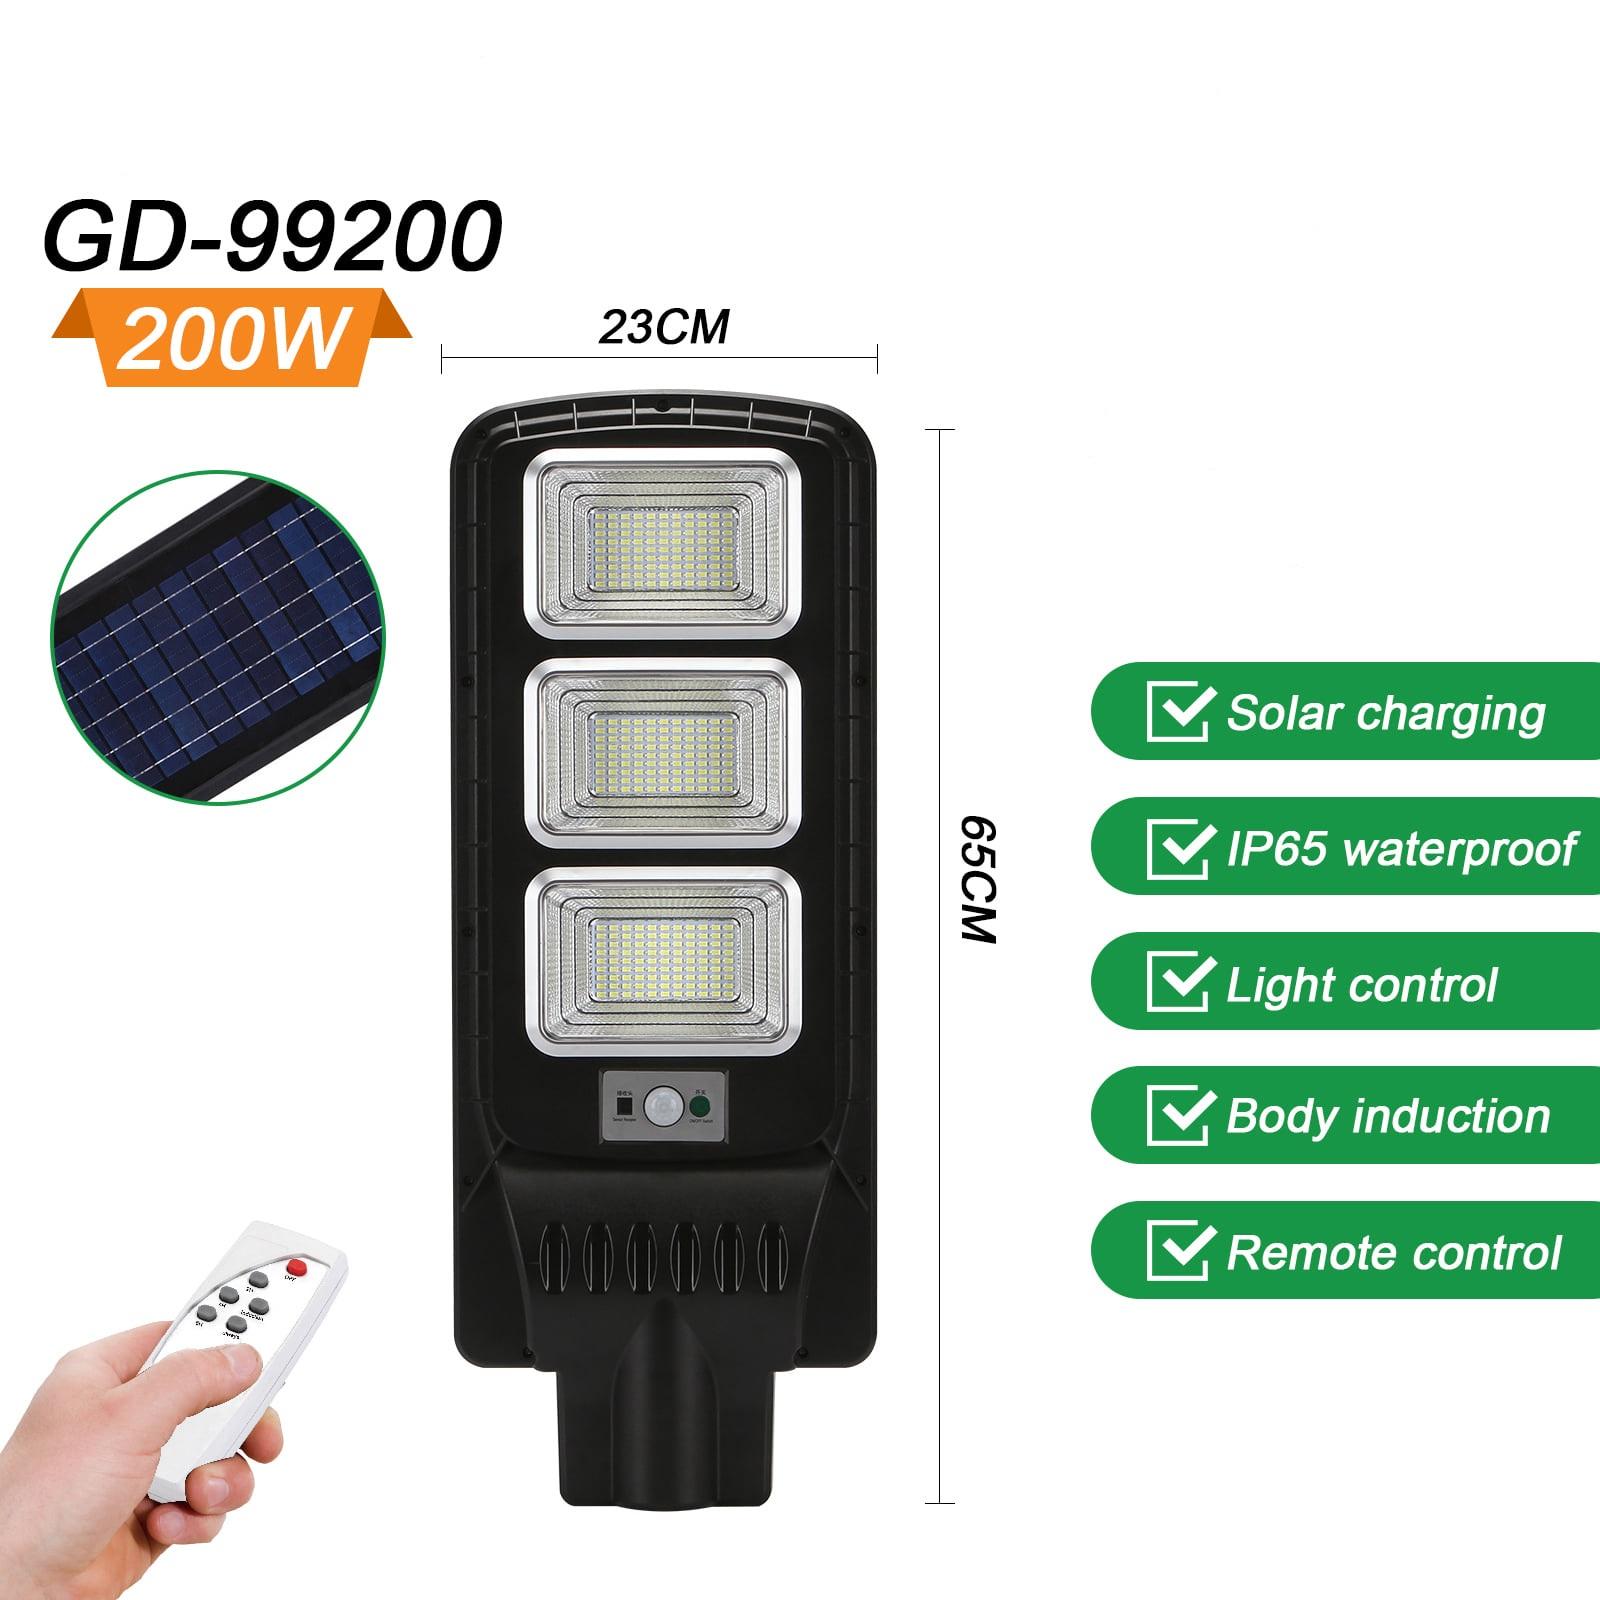 200 Watt Solar Street Light -GDPLUS GD99200